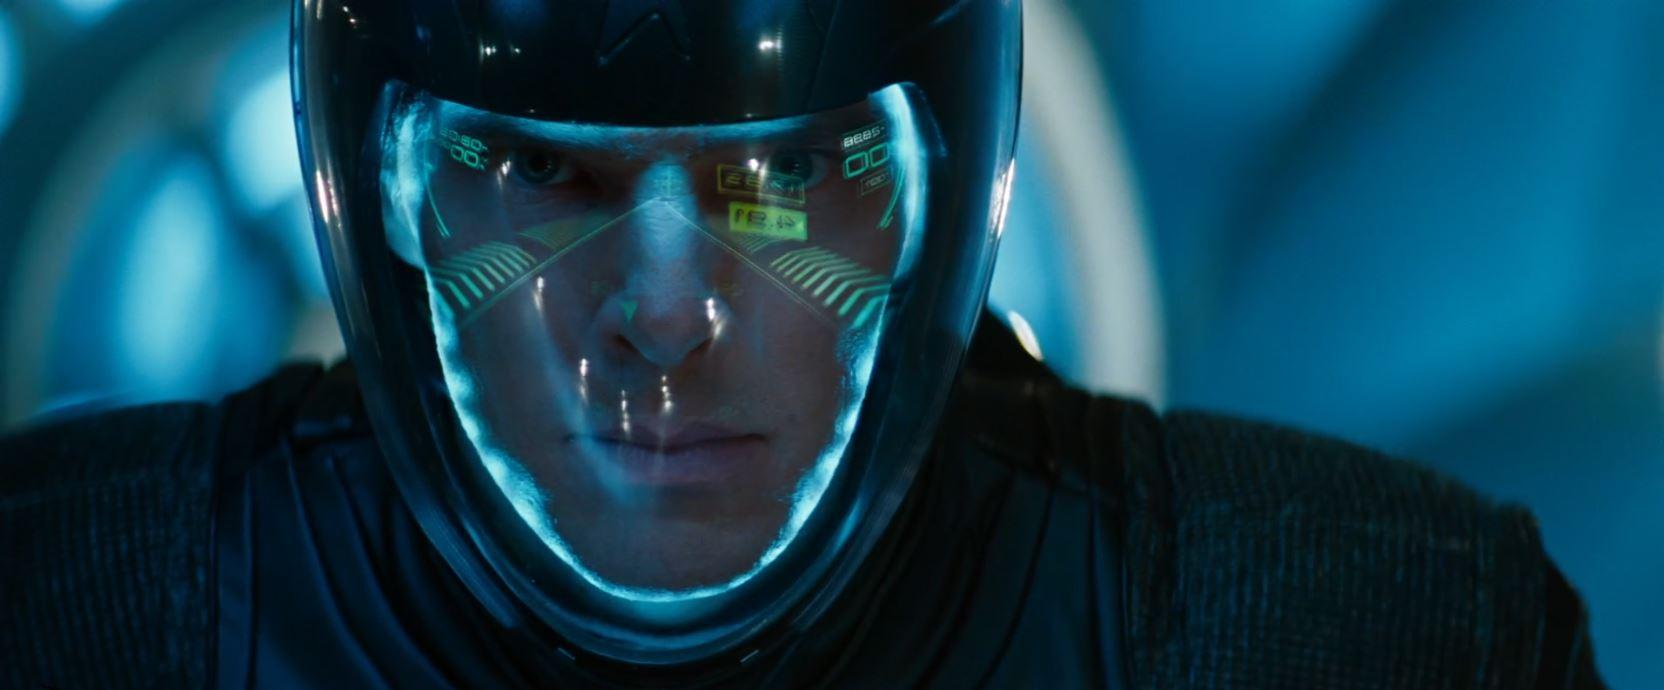 Star Trek Into Darkness - Benedict Cumberbatch as Khan